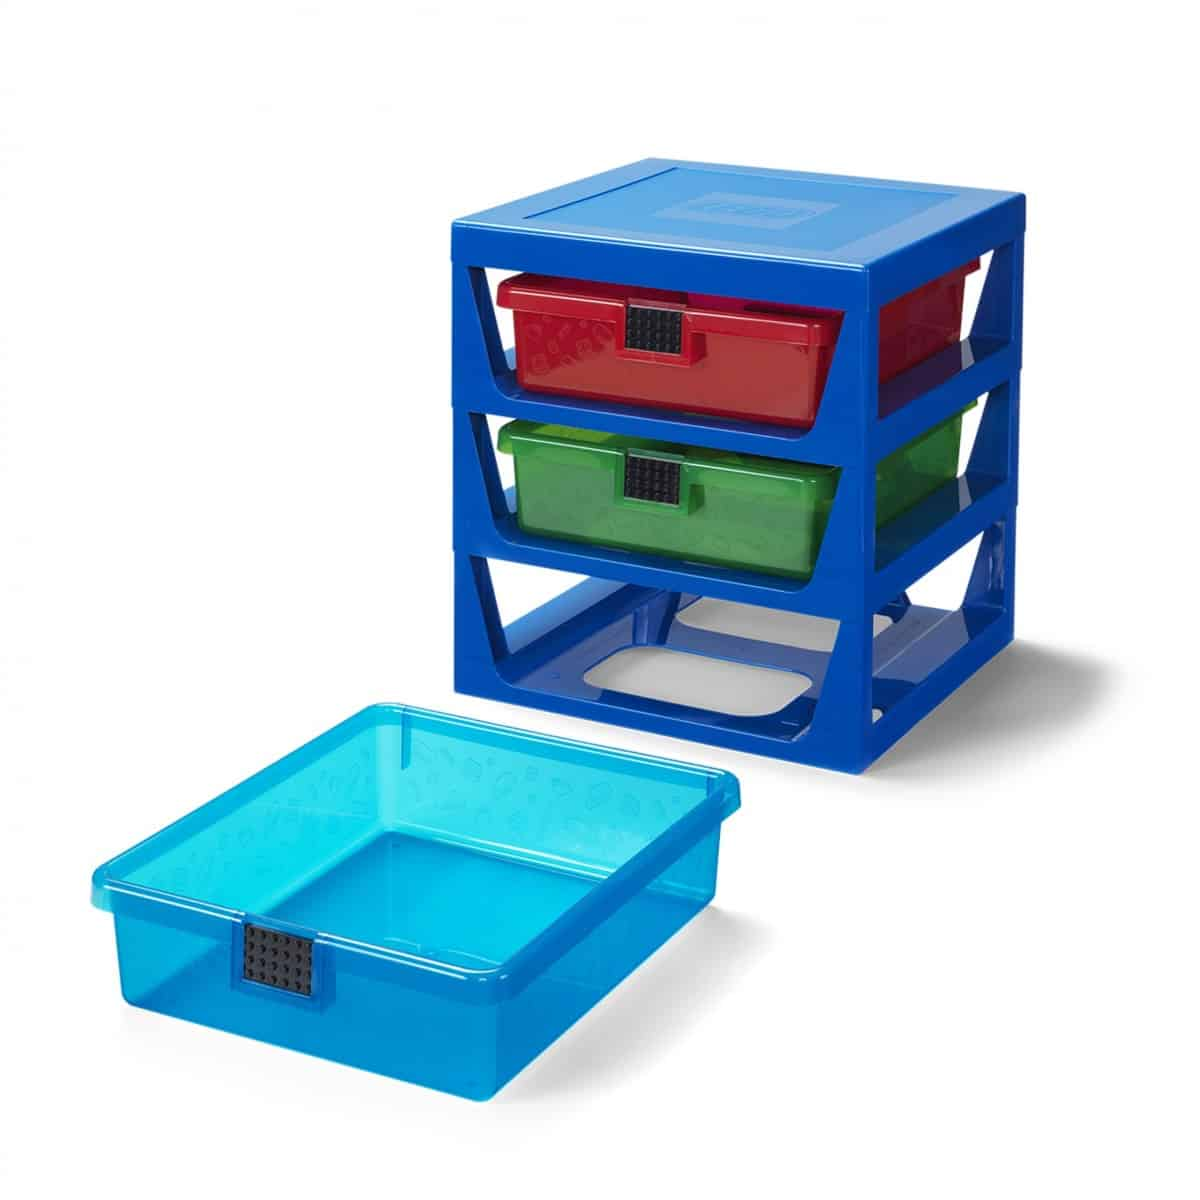 transparent blue lego 5006179 rack system scaled